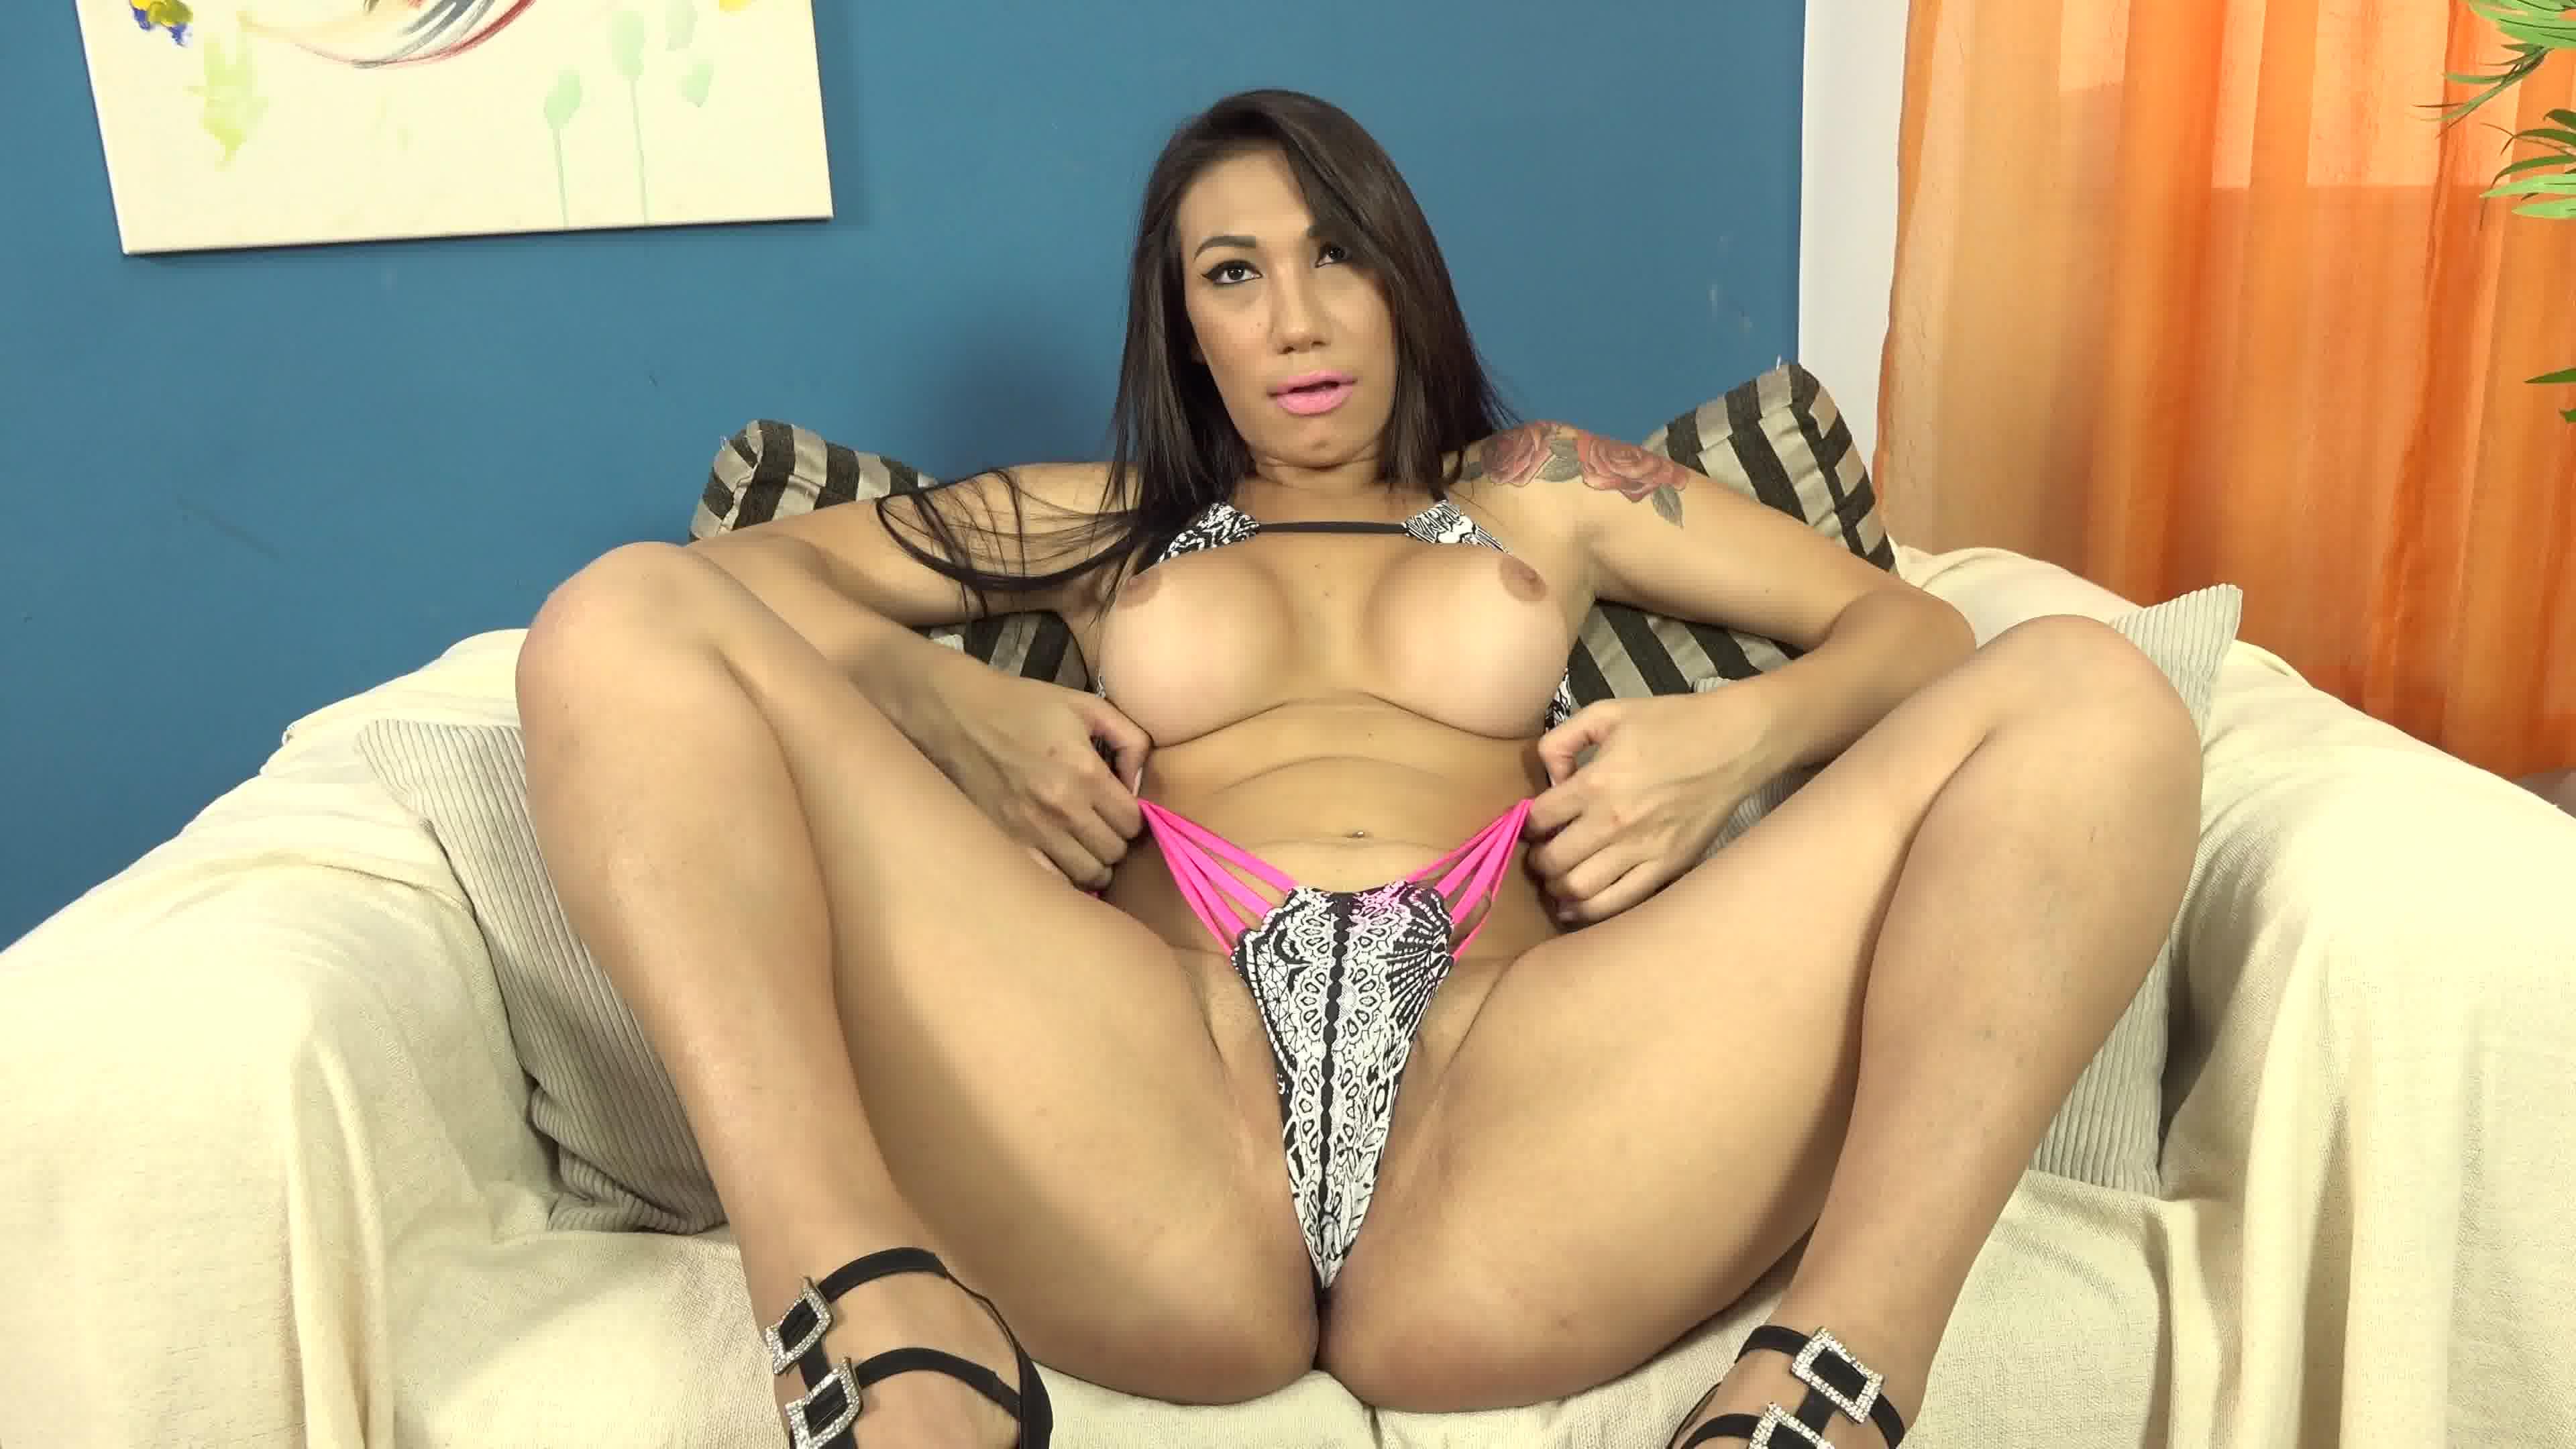 Big ass latina tranny services fat prick like a pro